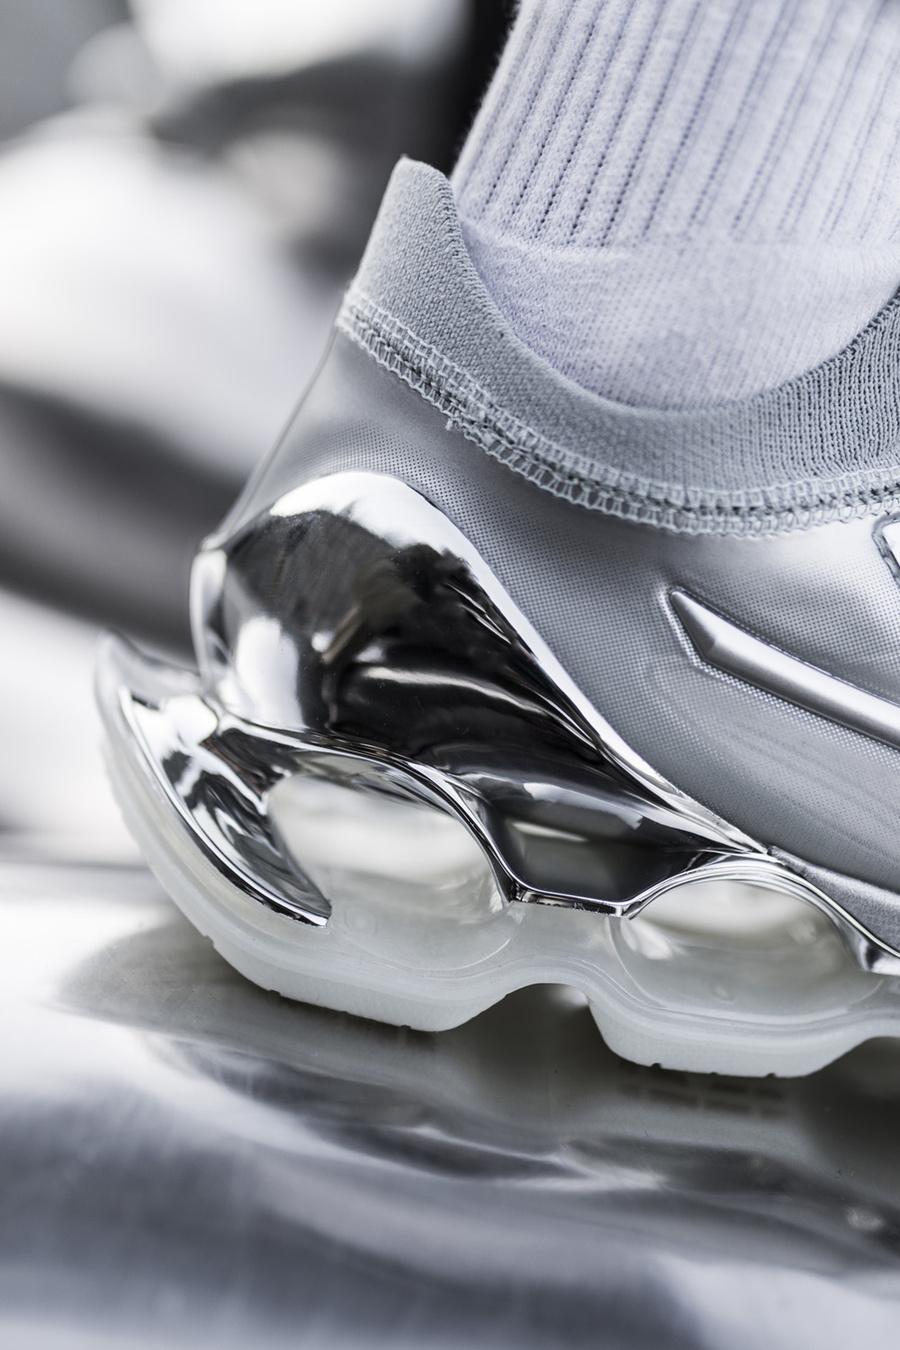 Mizuno,空山基  近期「最限量球鞋」就是它!潮流「性感大师」联名!发售信息曝光!